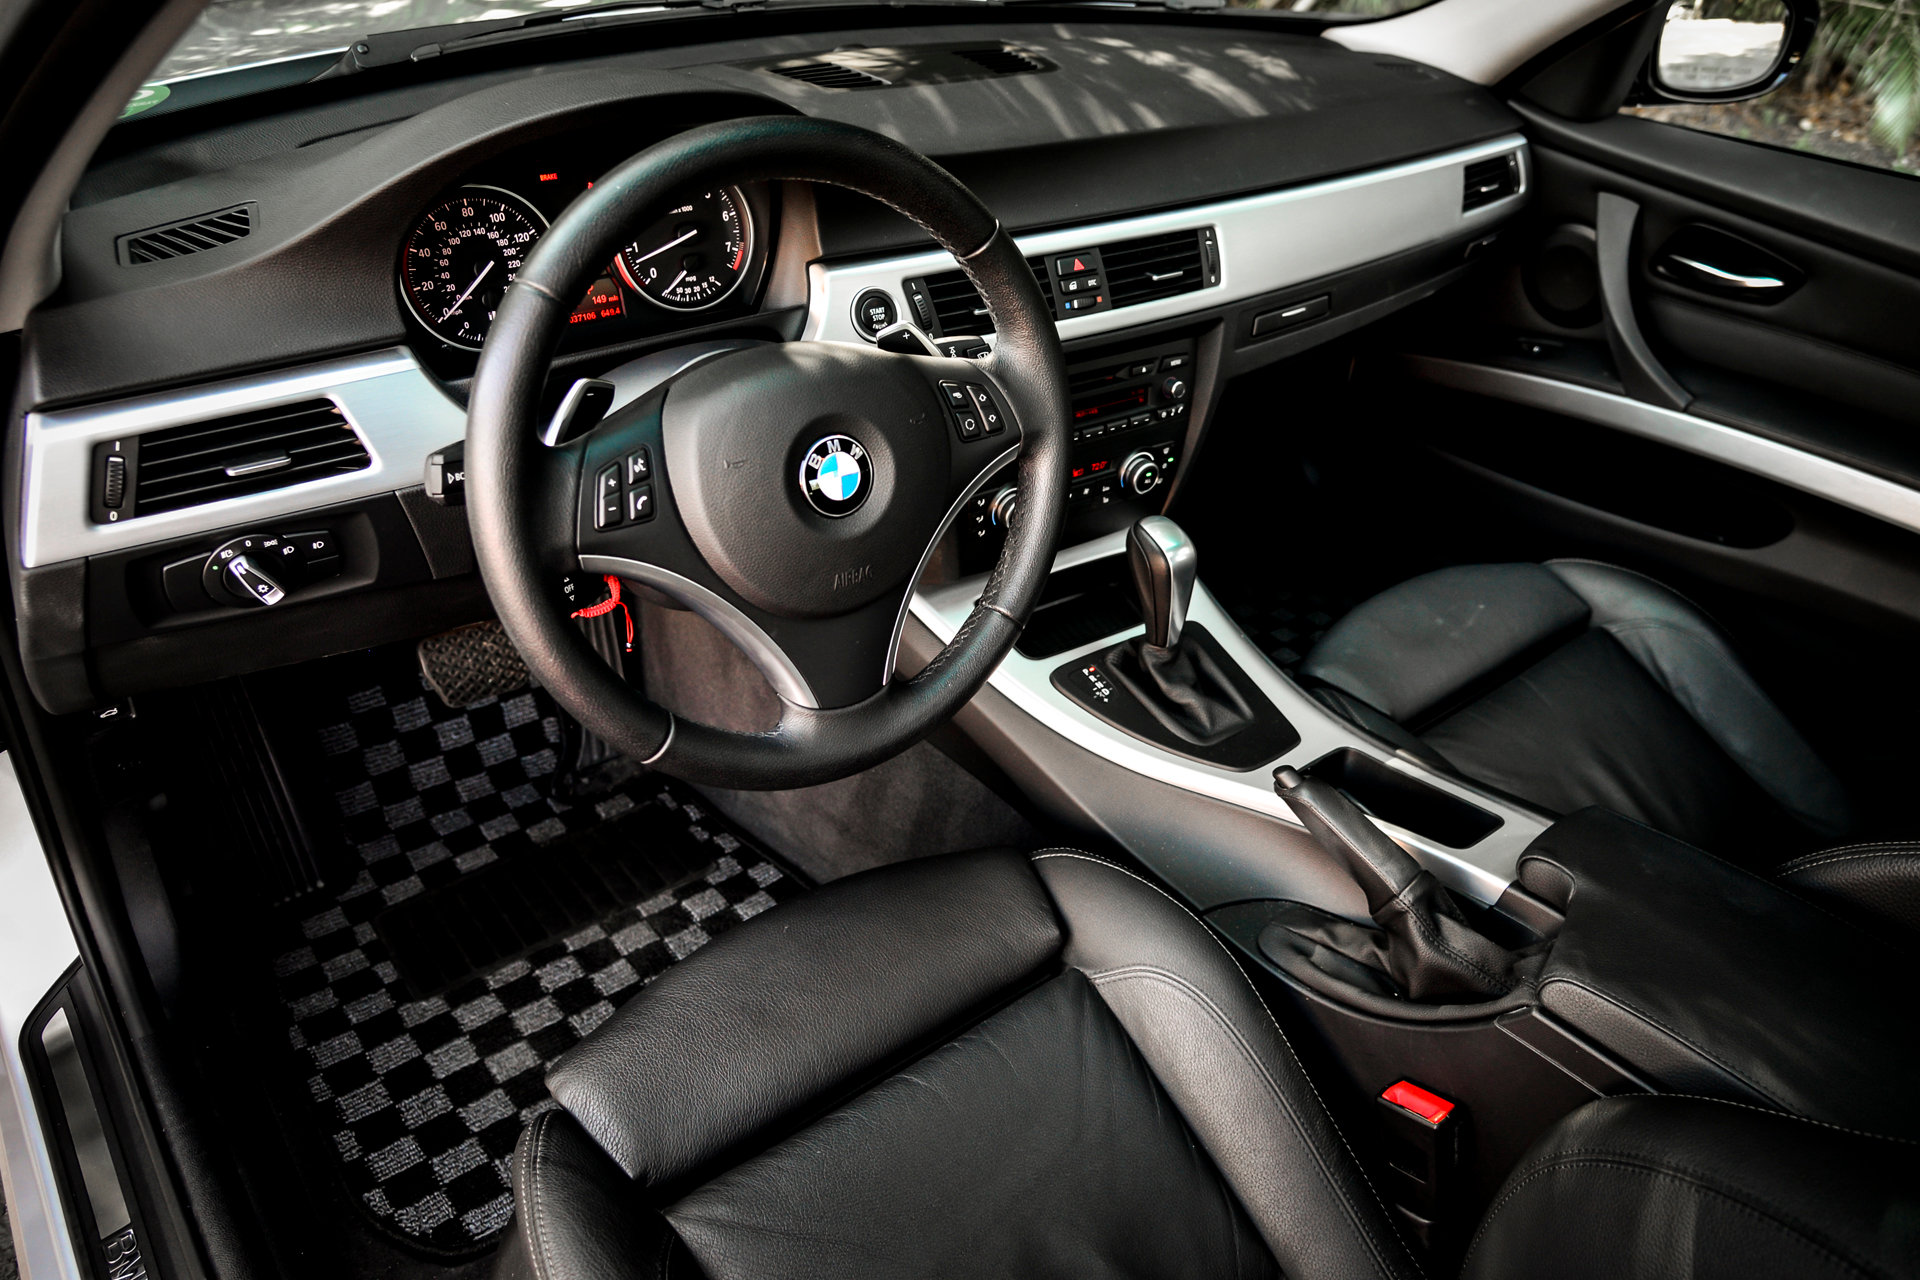 Dragint Mats Bmw 3 Series Sedan And Coupe 2wd E90 E92 06 13